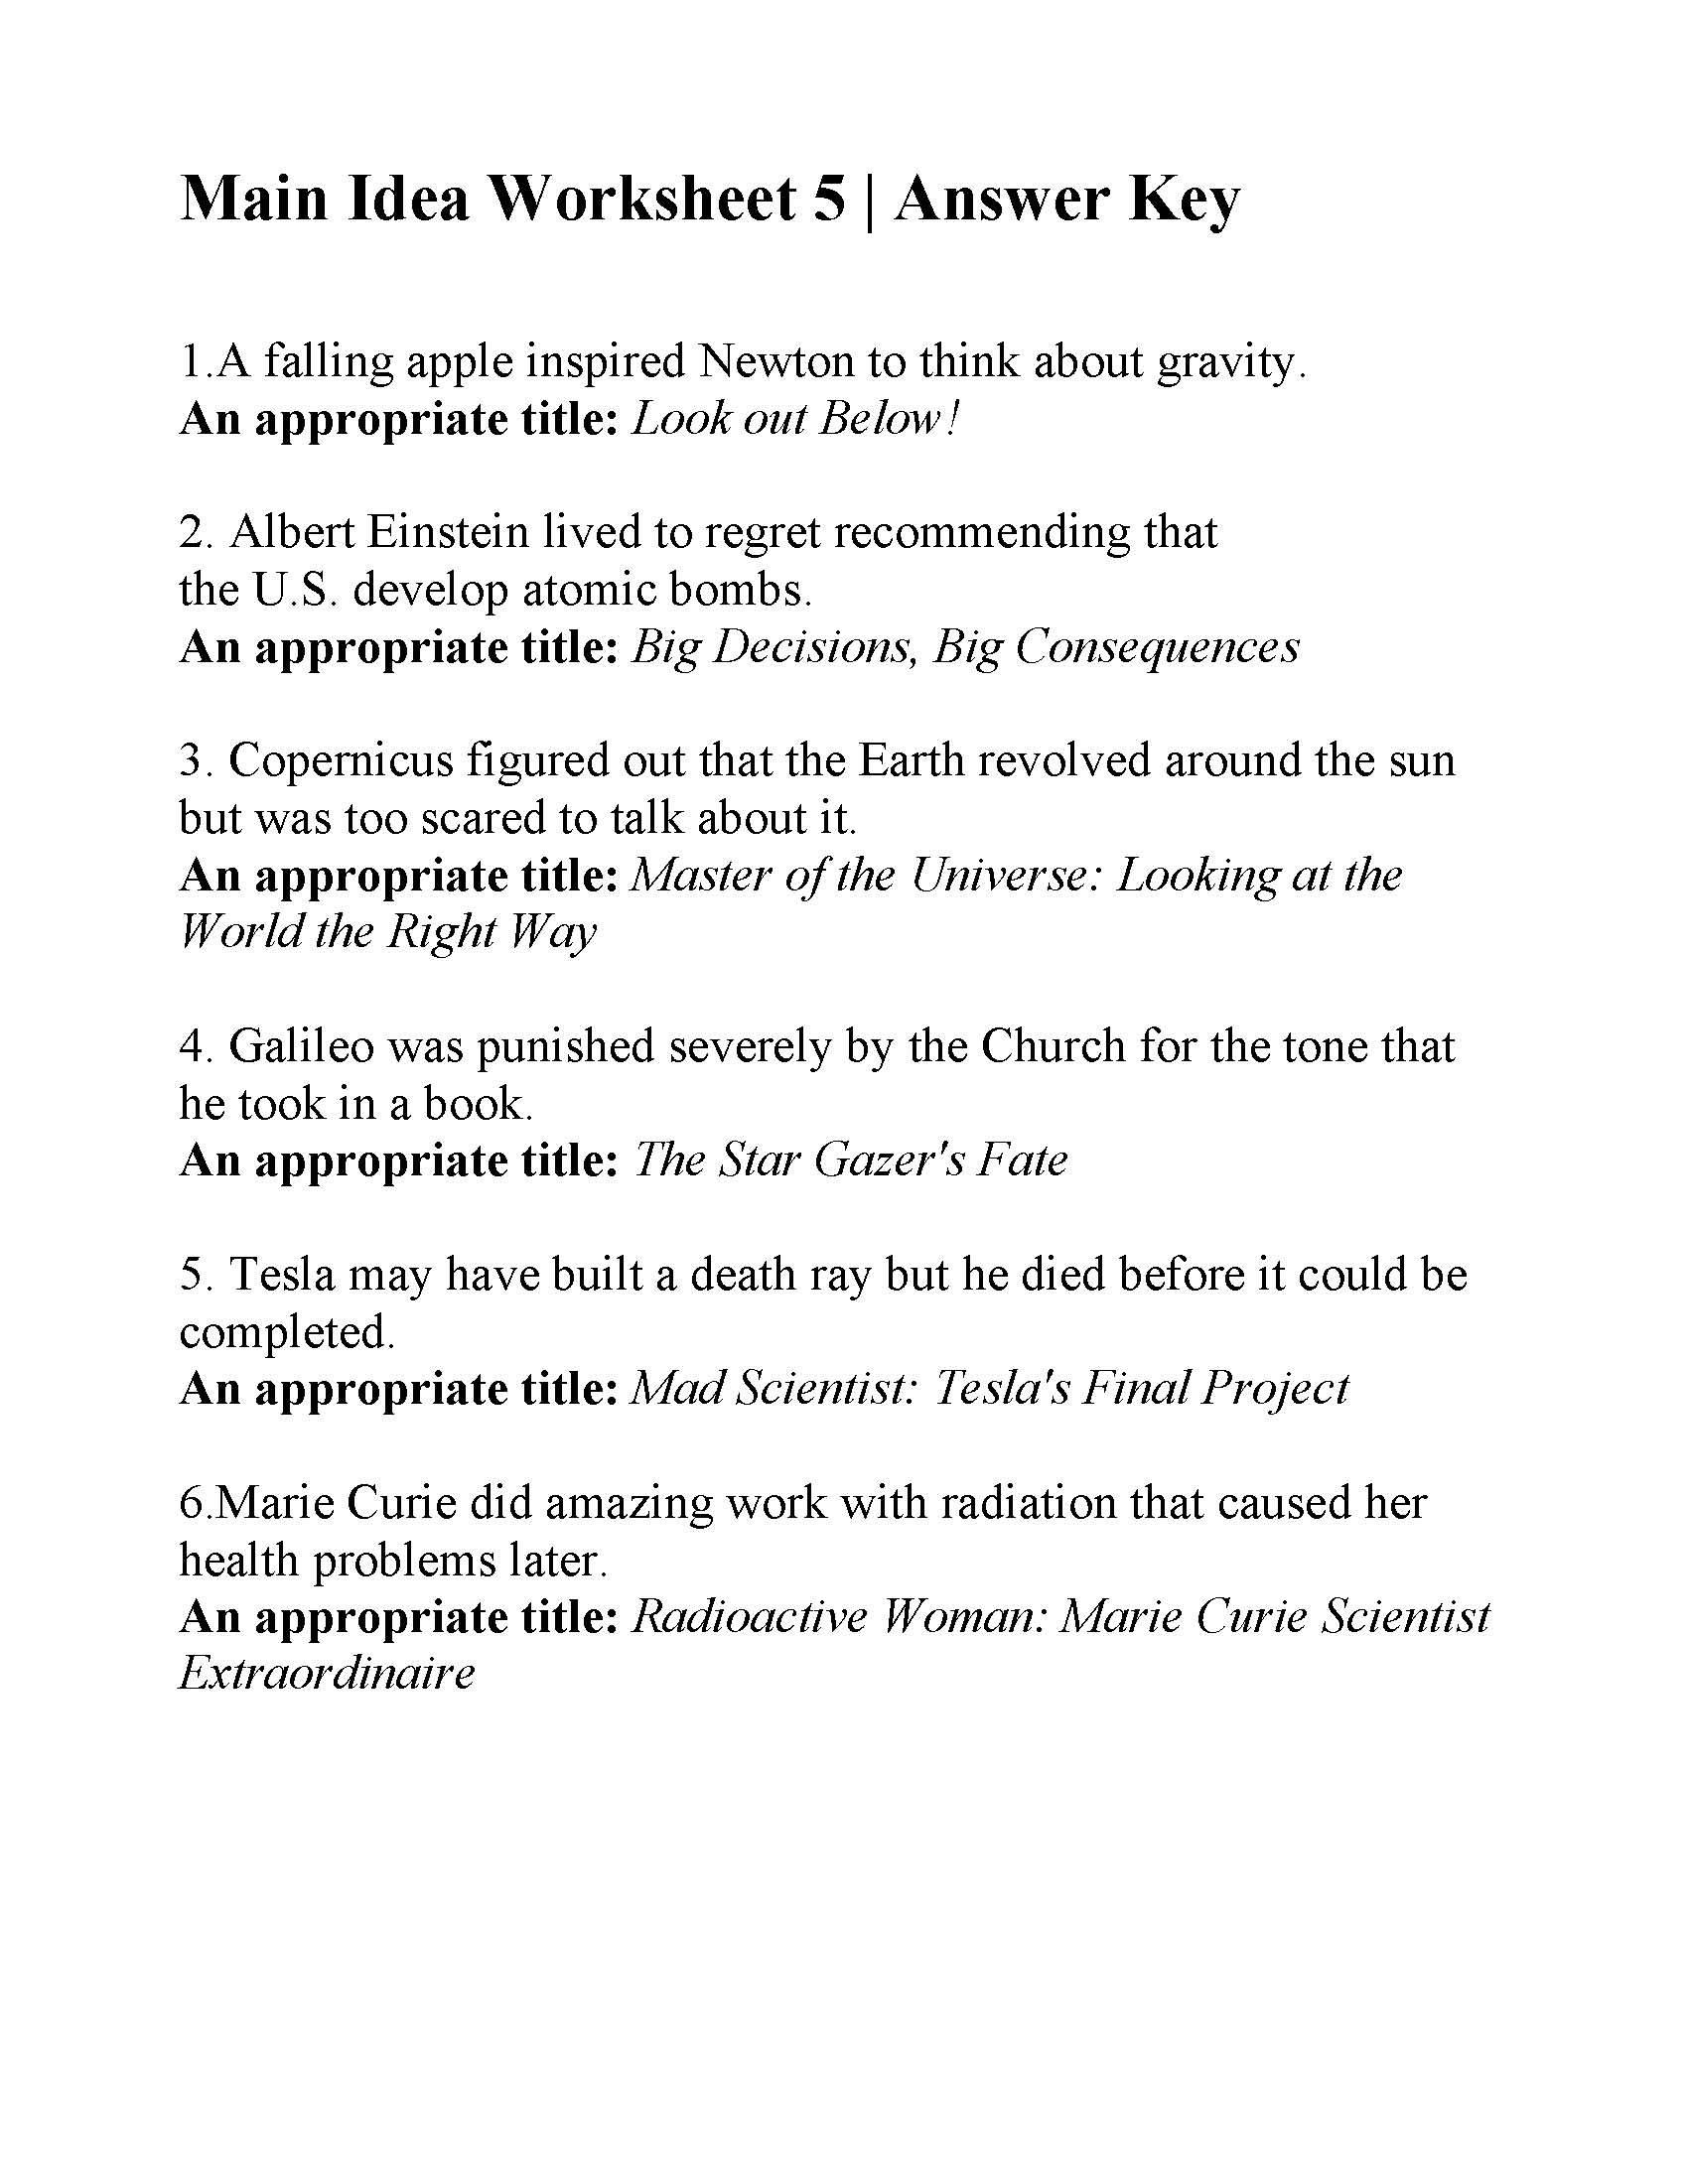 5th Grade Main Idea Worksheets Main Idea Worksheet 5